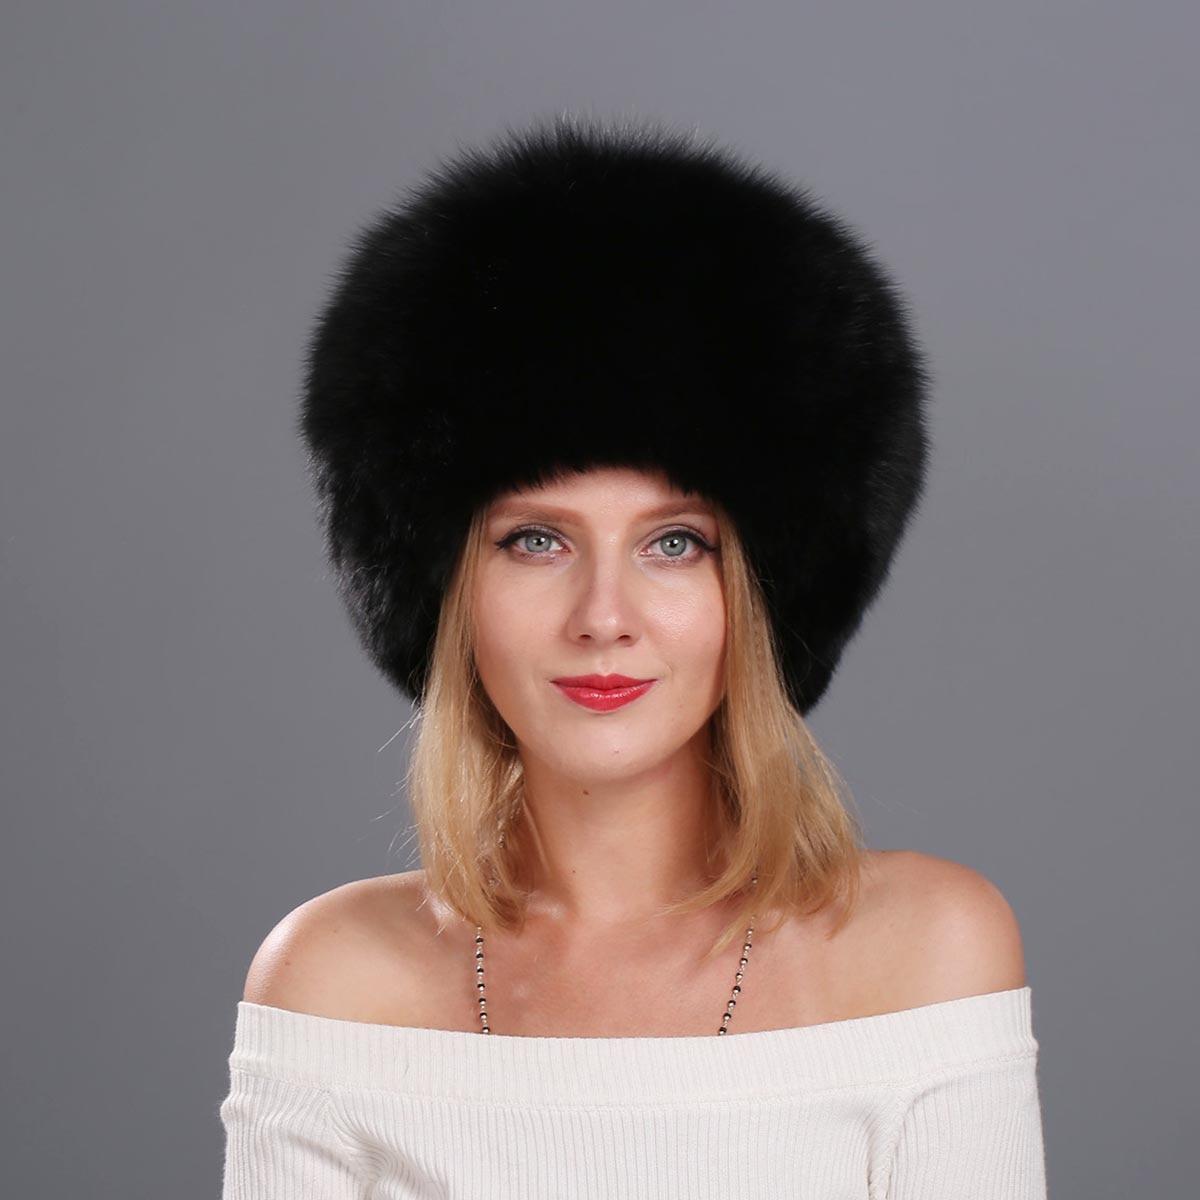 2016 Women 's Genuine Fox Fur Cap Beanies Russian Winter Fur Hat 100% Real Fox Fur Hat Black White Silver Fox каталог fox s